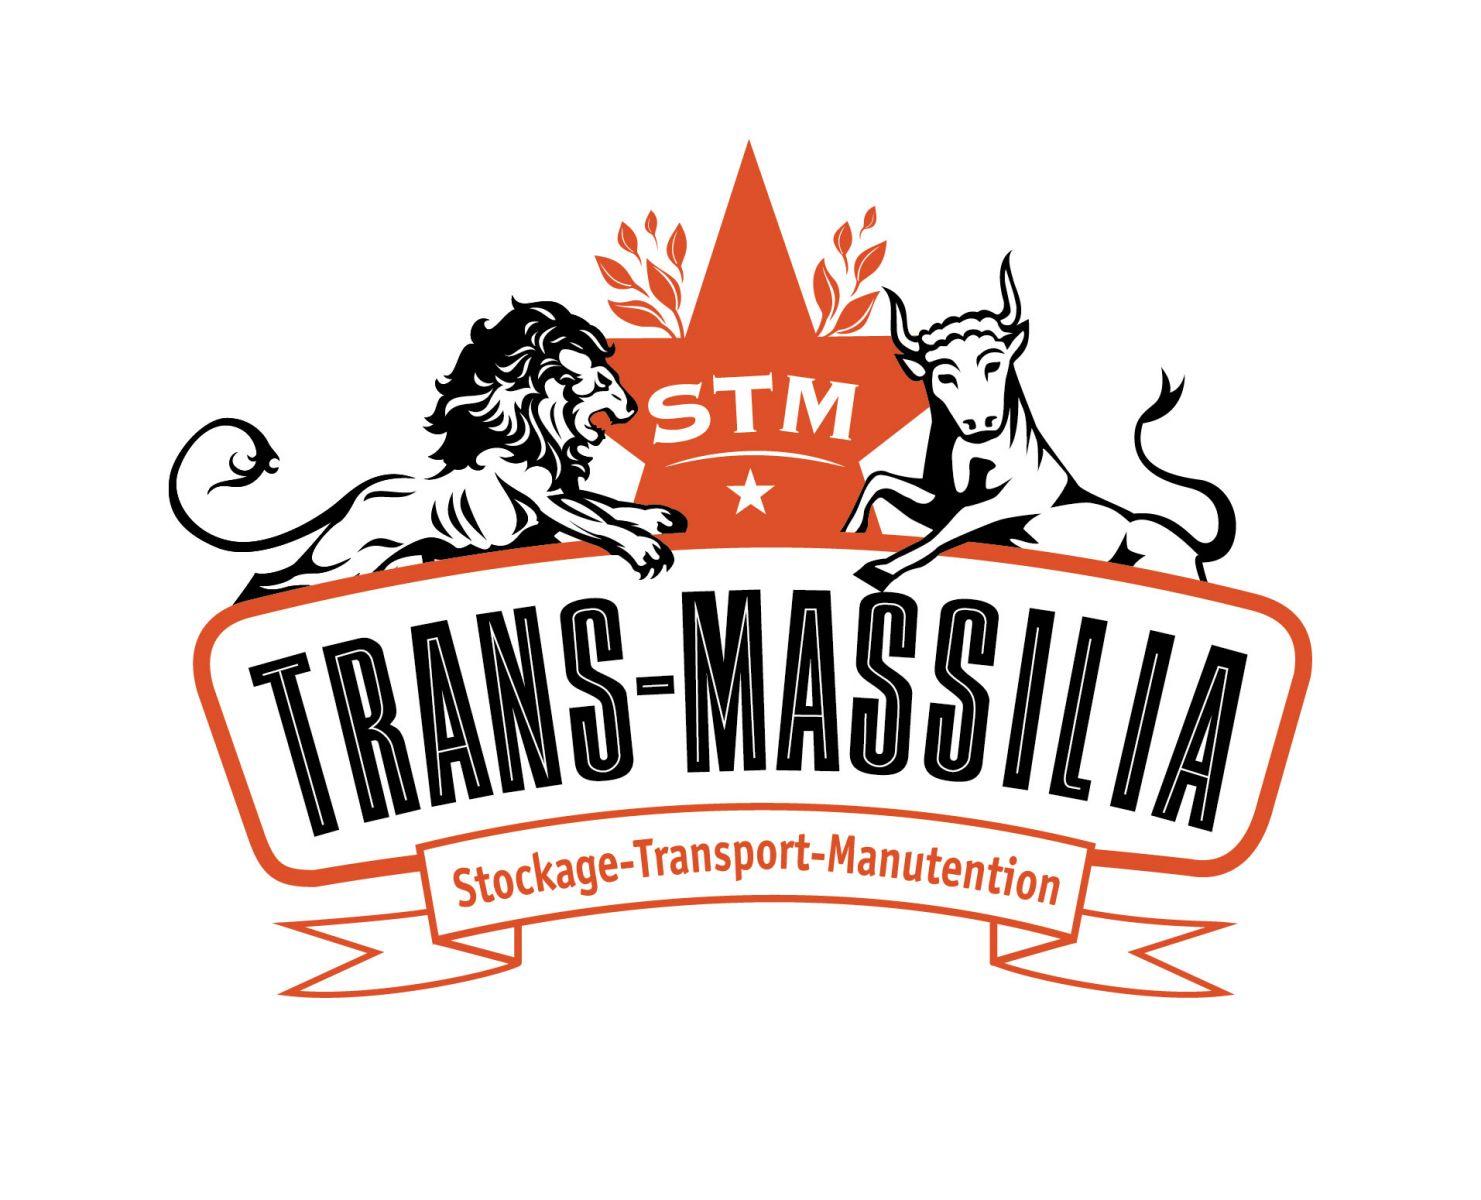 trans-massilia cress paca